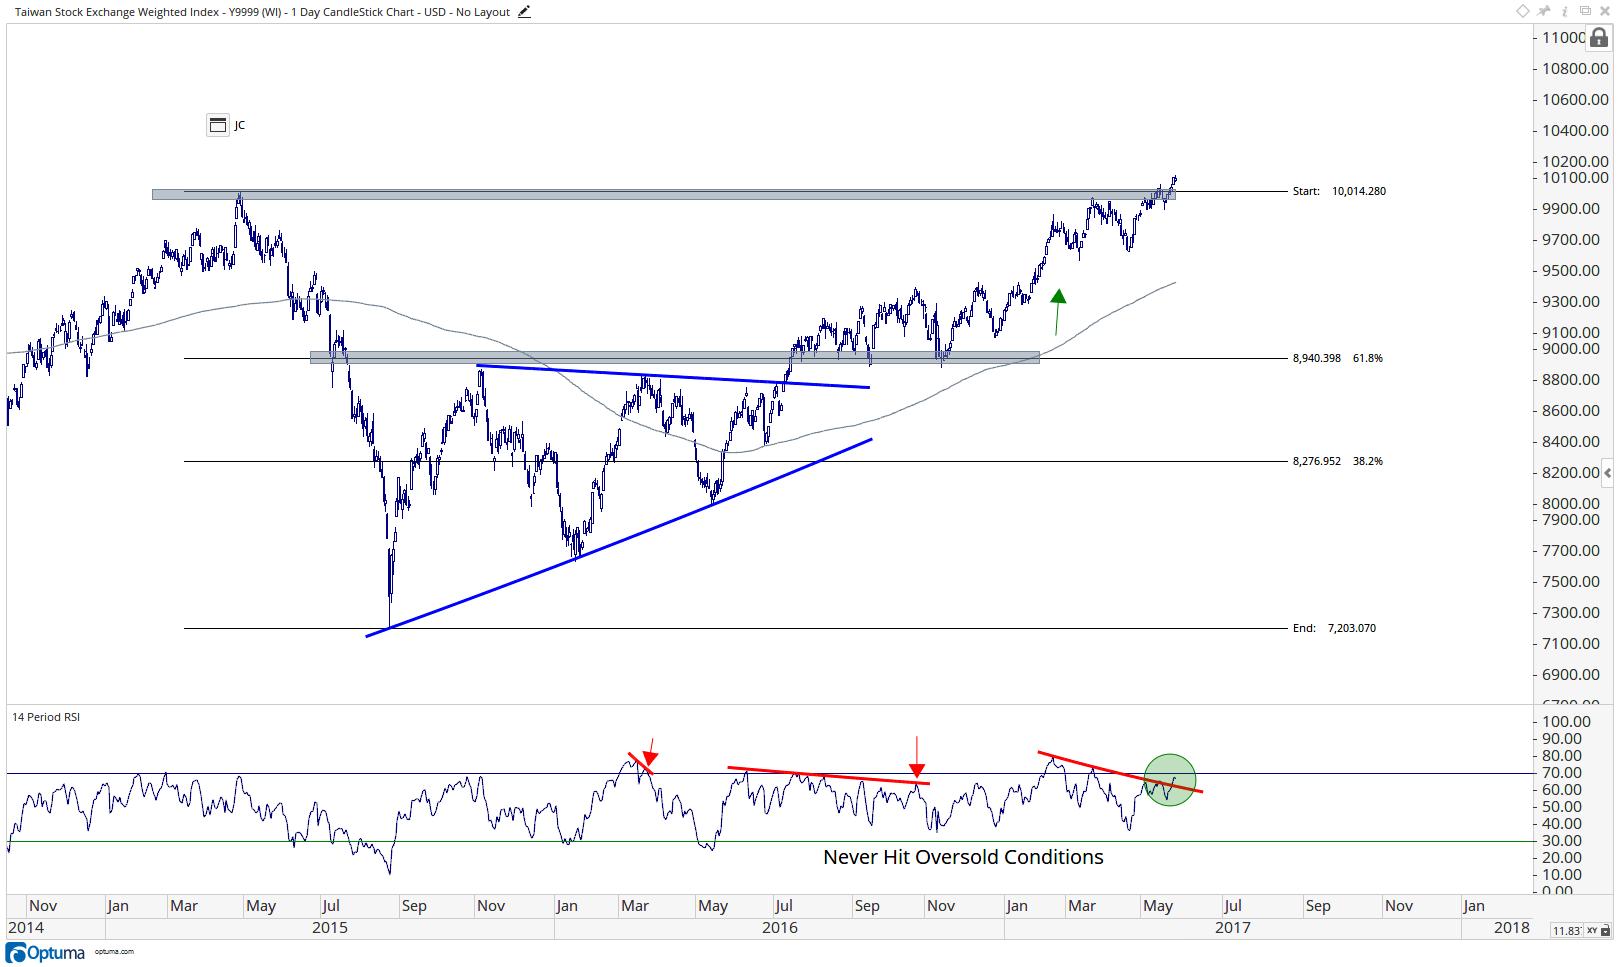 Taiwan Stock Exchange Index